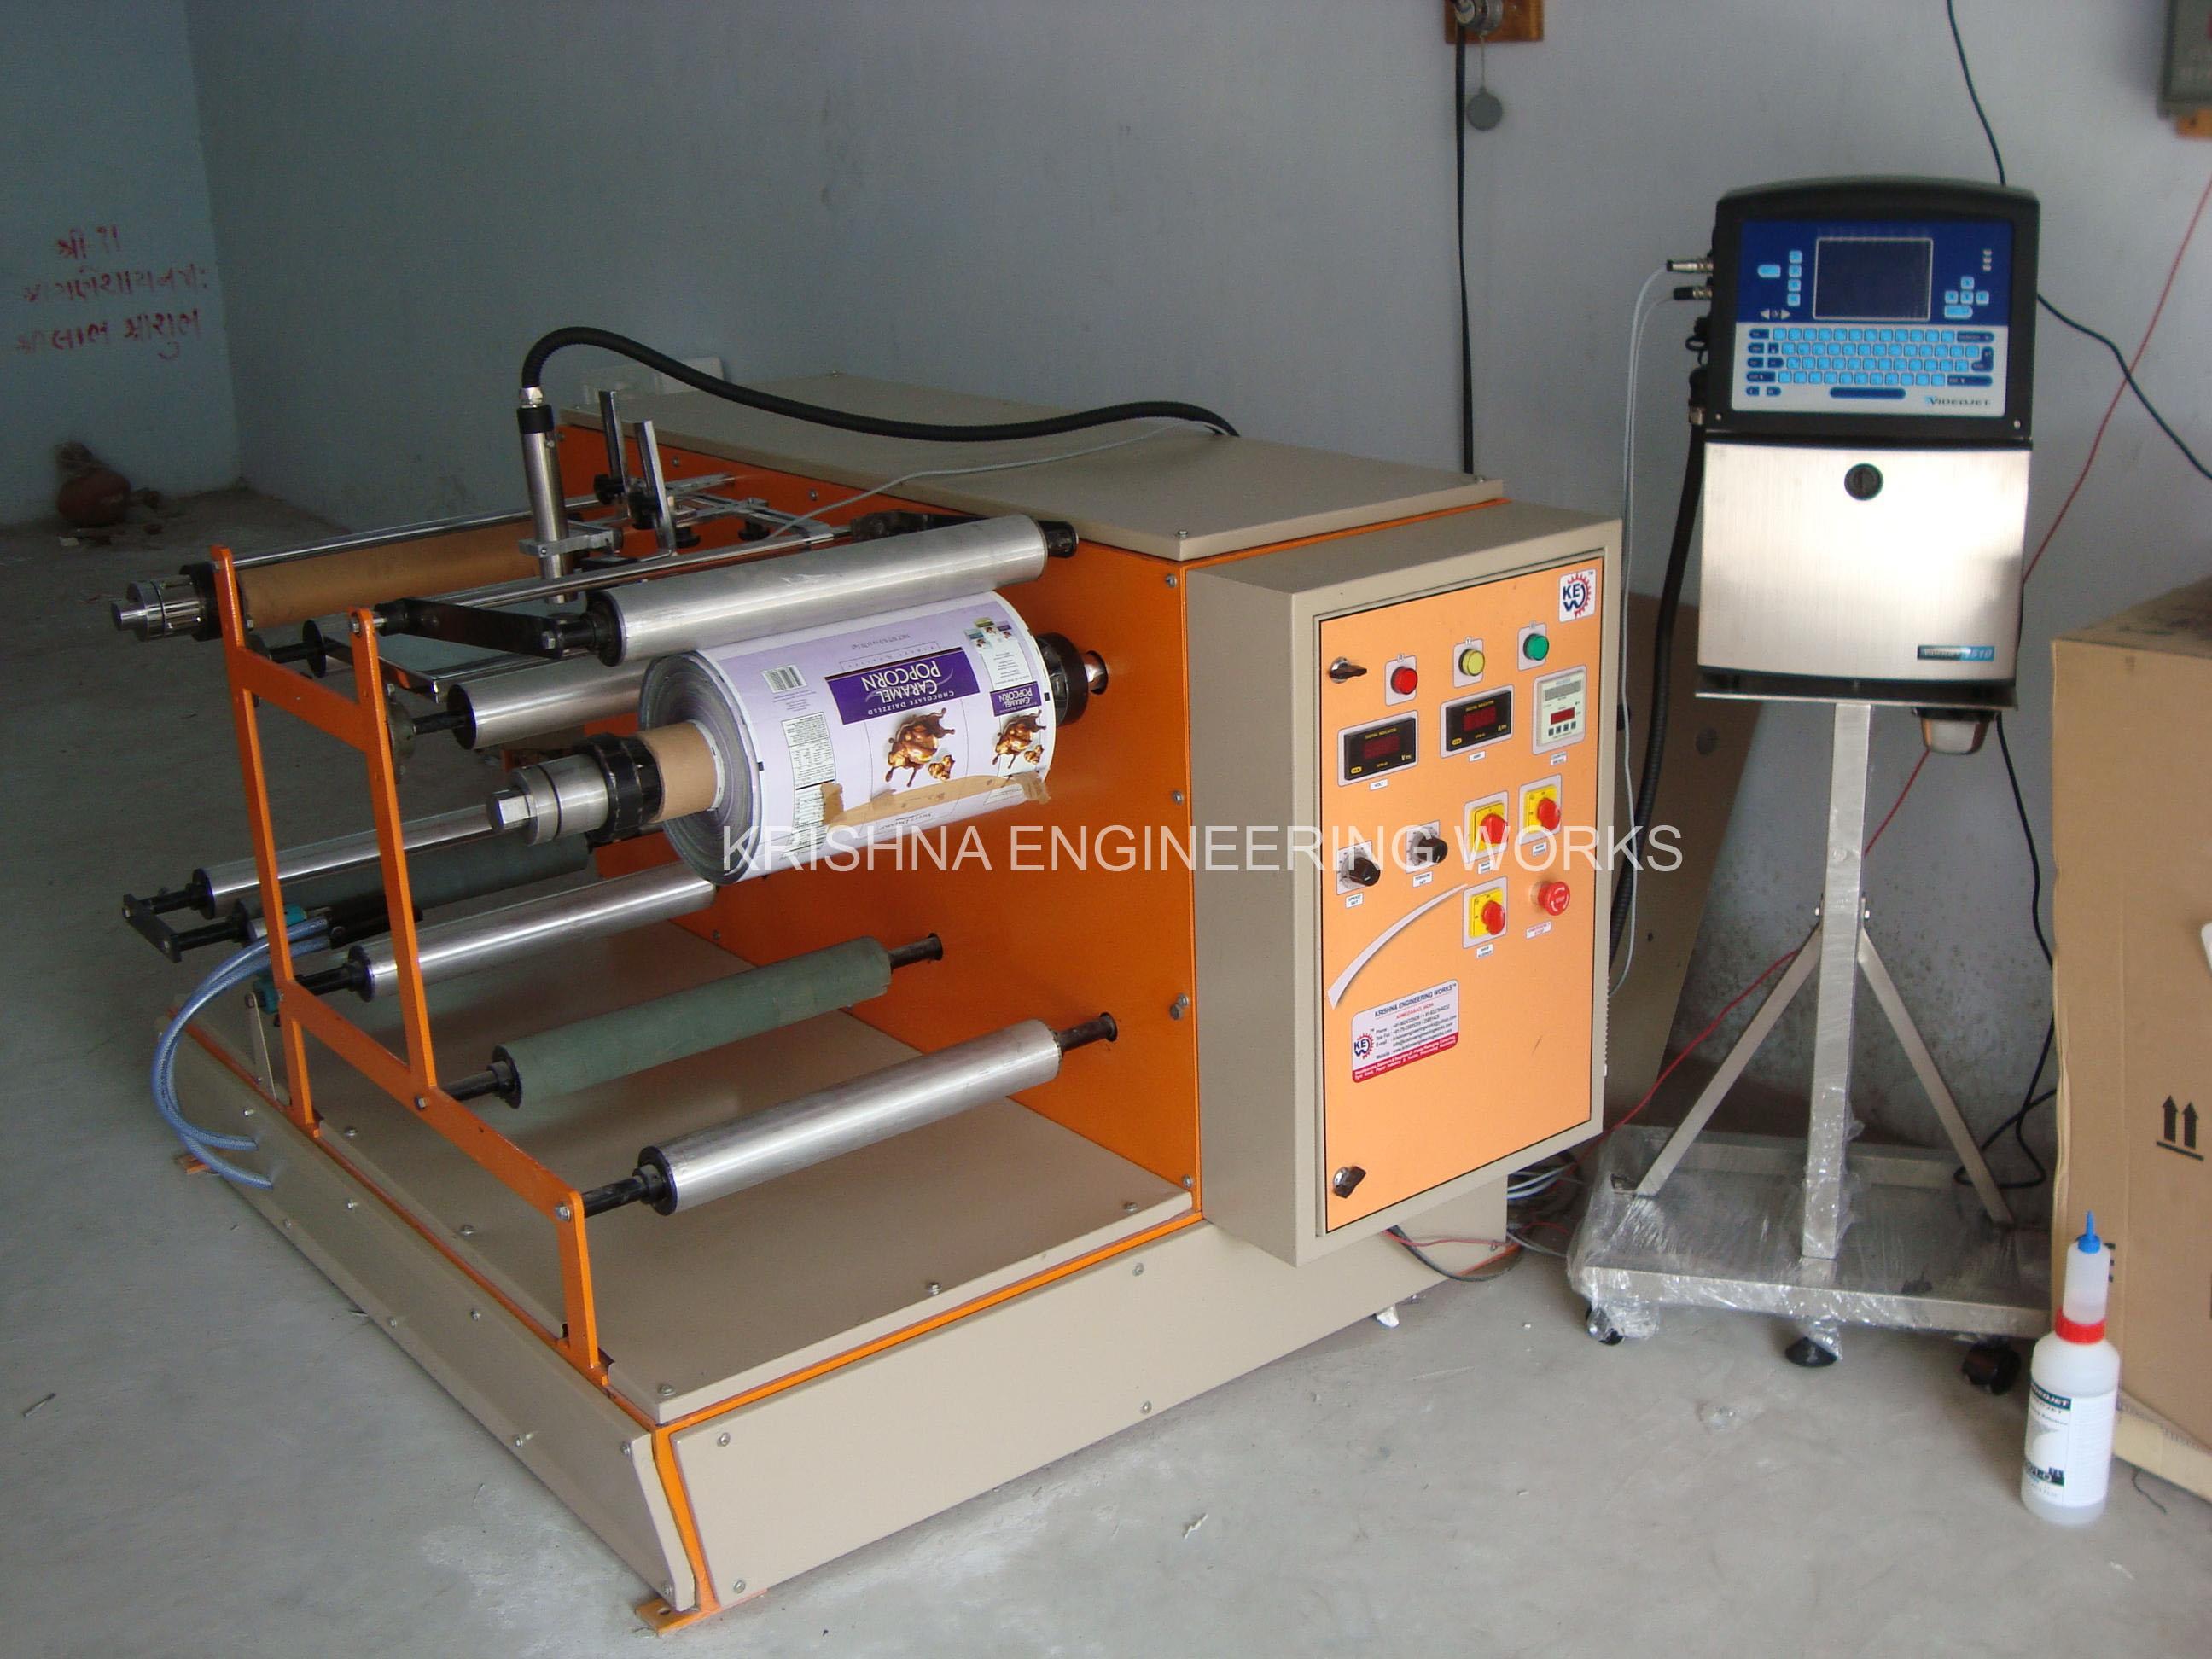 "<a href=""http://www.krishnaengineeringworks.com.mx/maquina-de-enrrollamiento-el-rebobinar/"">Máquina de Enrrollamiento el Rebobinar</a>"